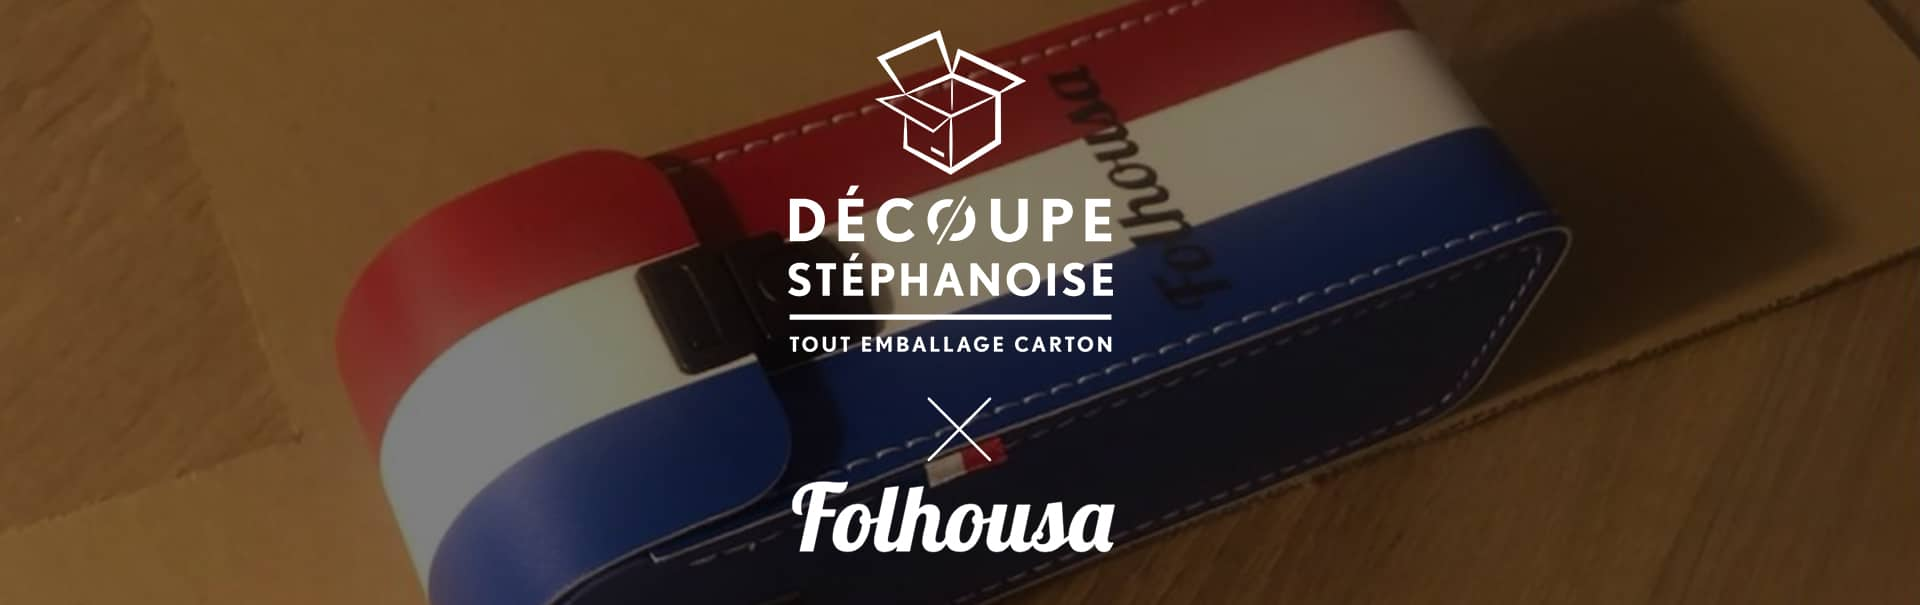 Collaboration Folhousa et Découpe Stéphanoise